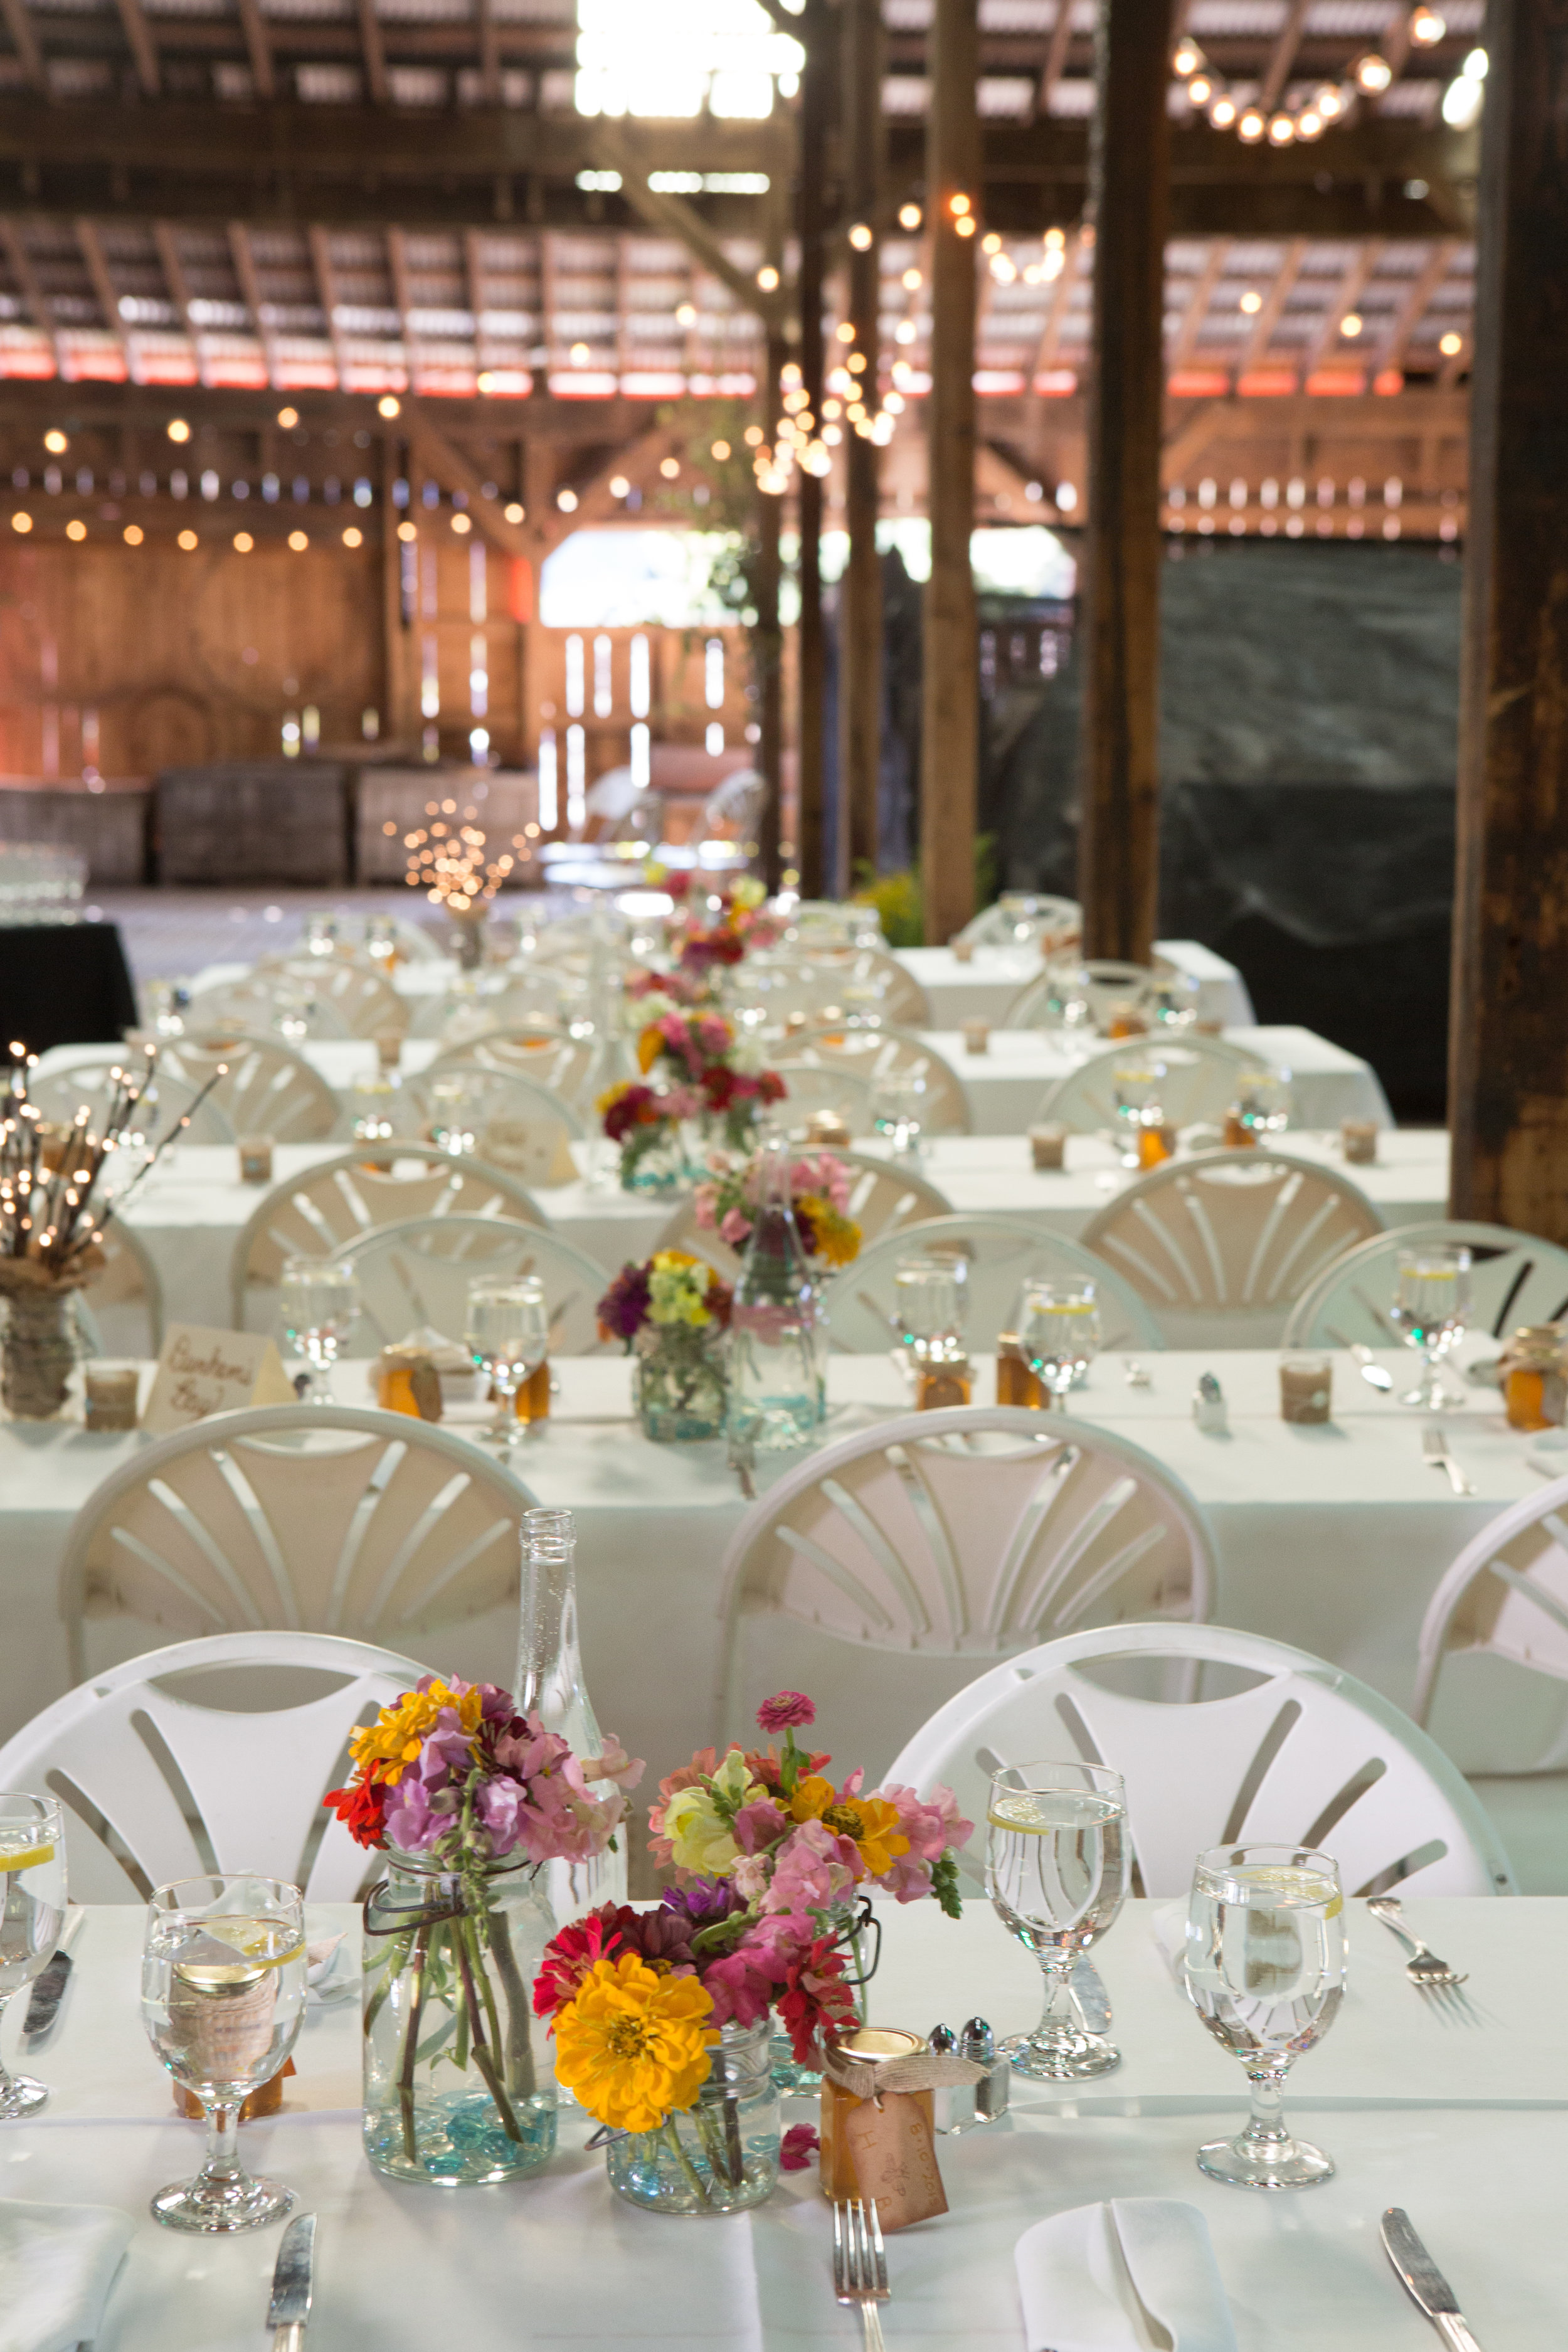 flowers on tables.jpg